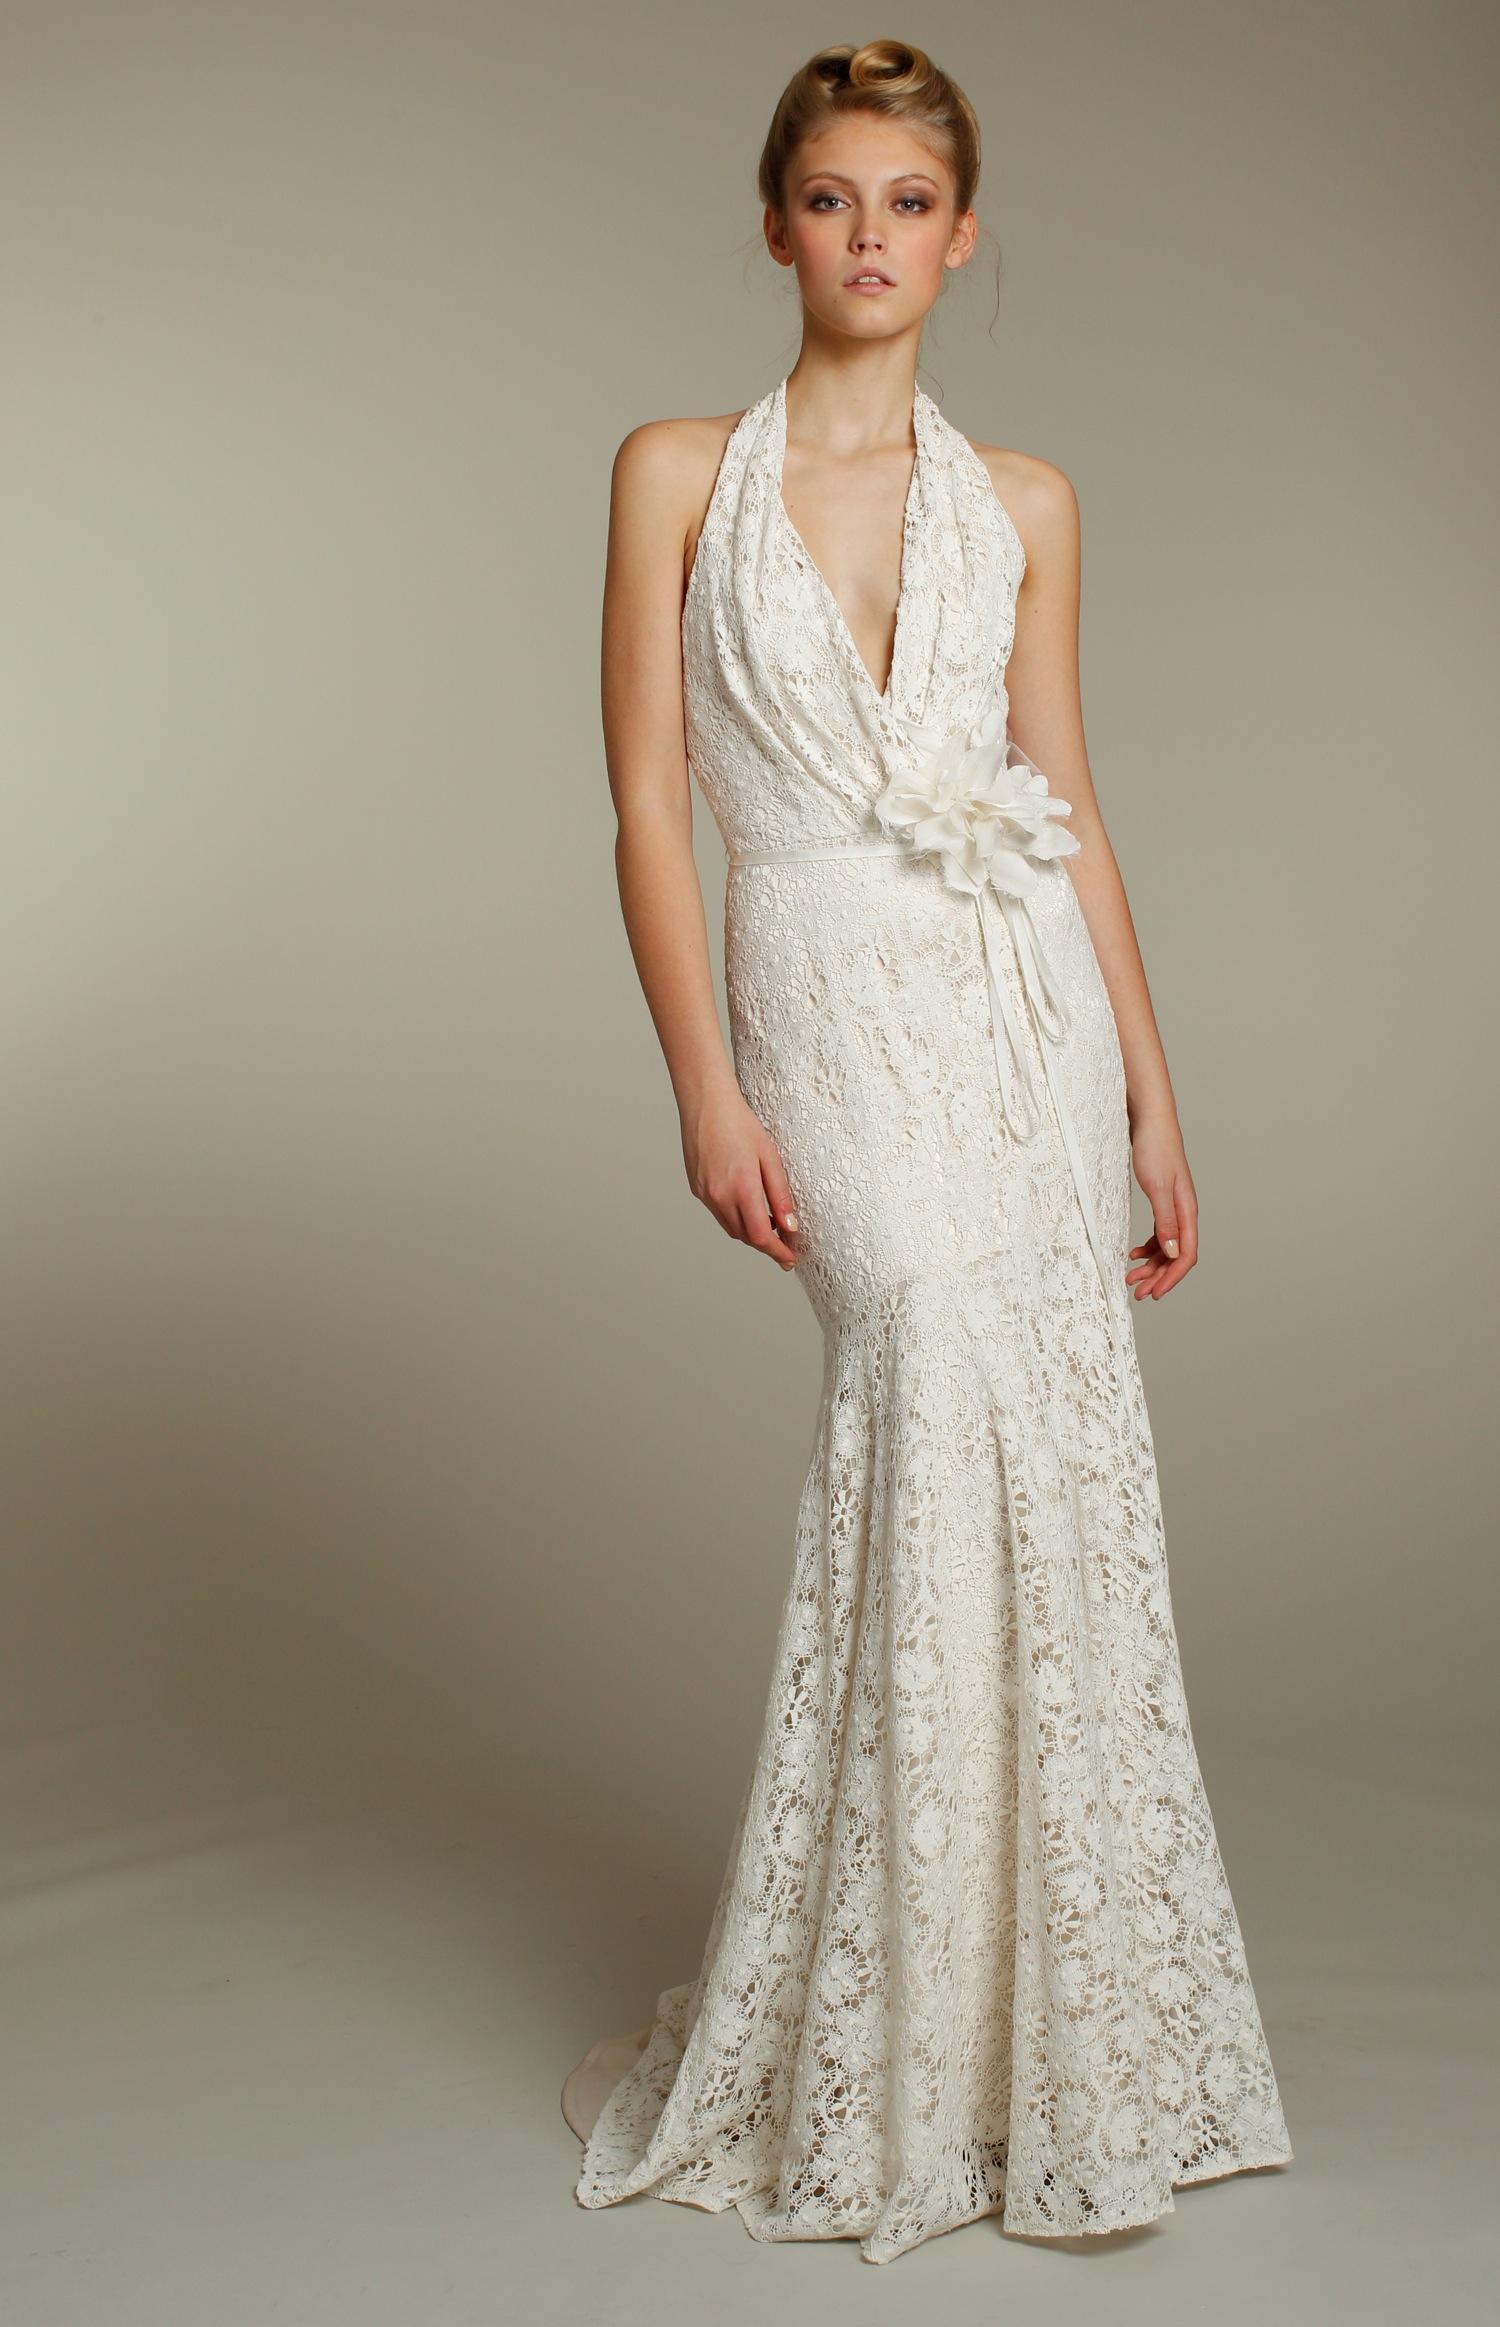 informal lace wedding dresses photo - 1